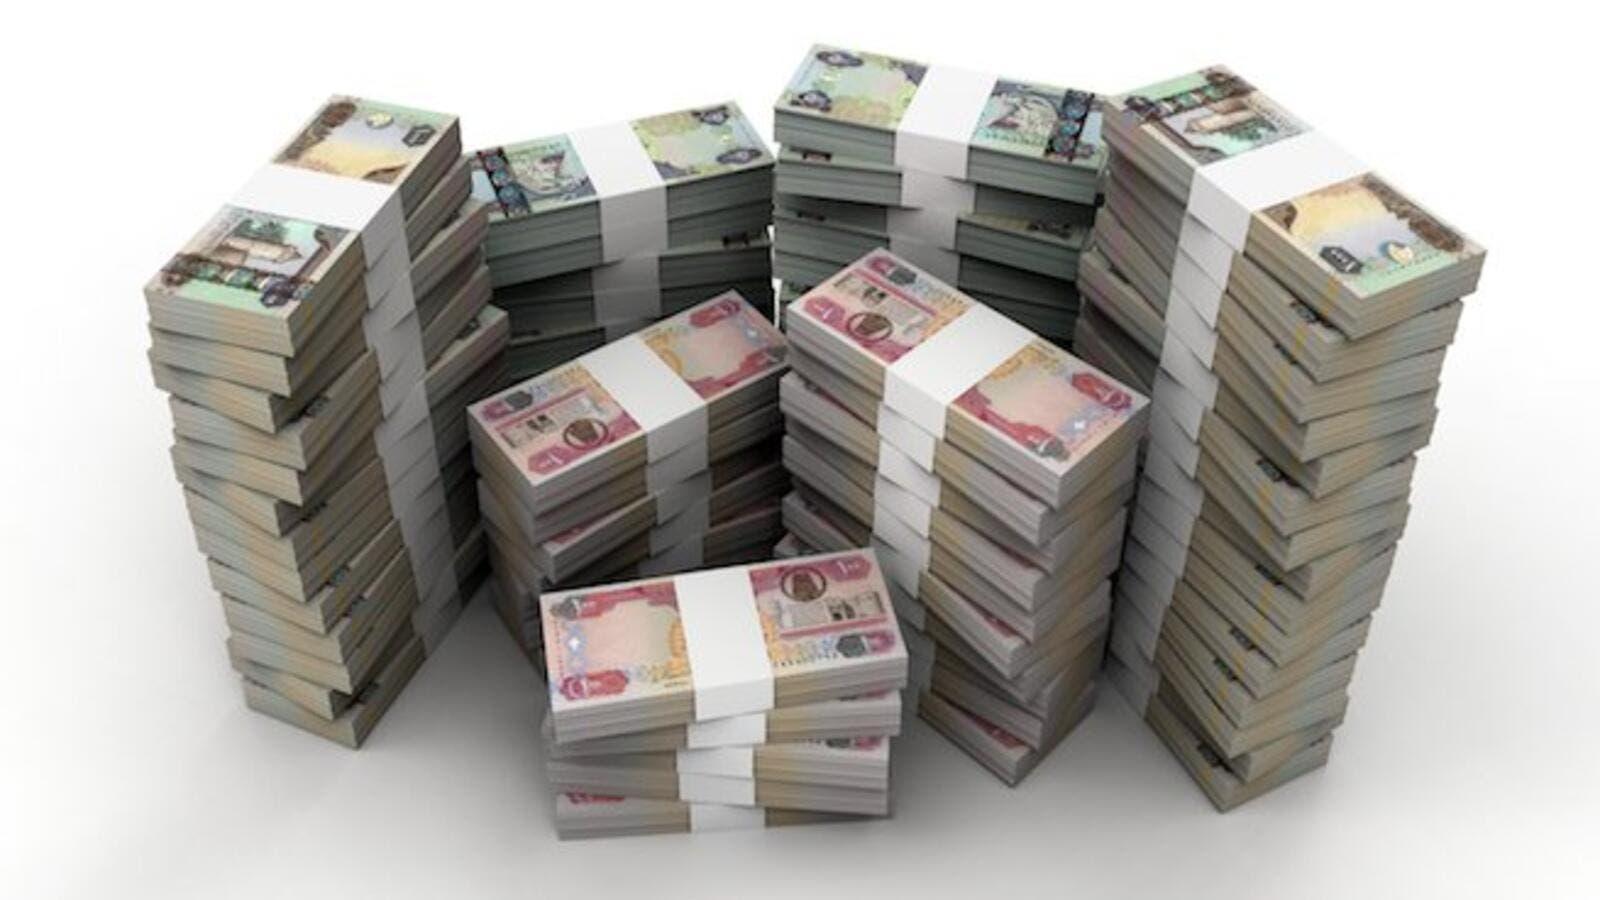 Gang Arrested in UAE for Stealing Dh 4 Million | Al Bawaba